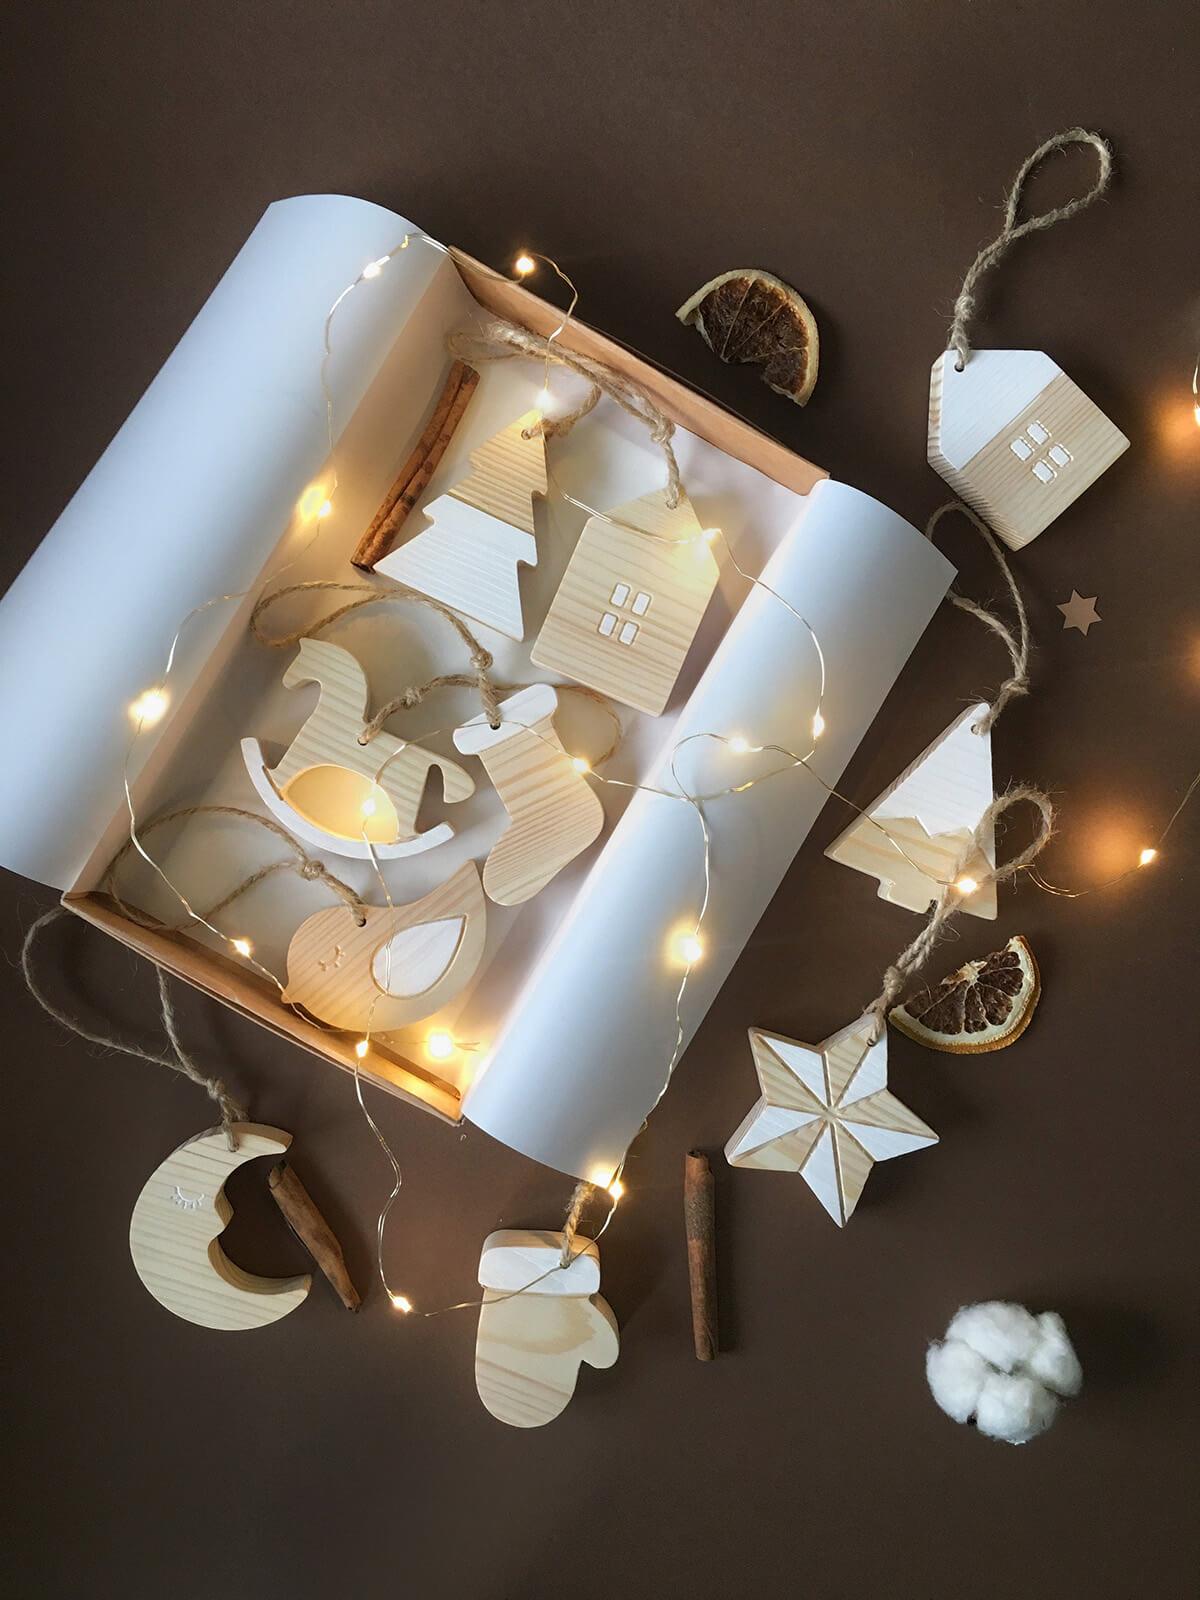 Pine Block Winter Motif Ornaments, Set of 10